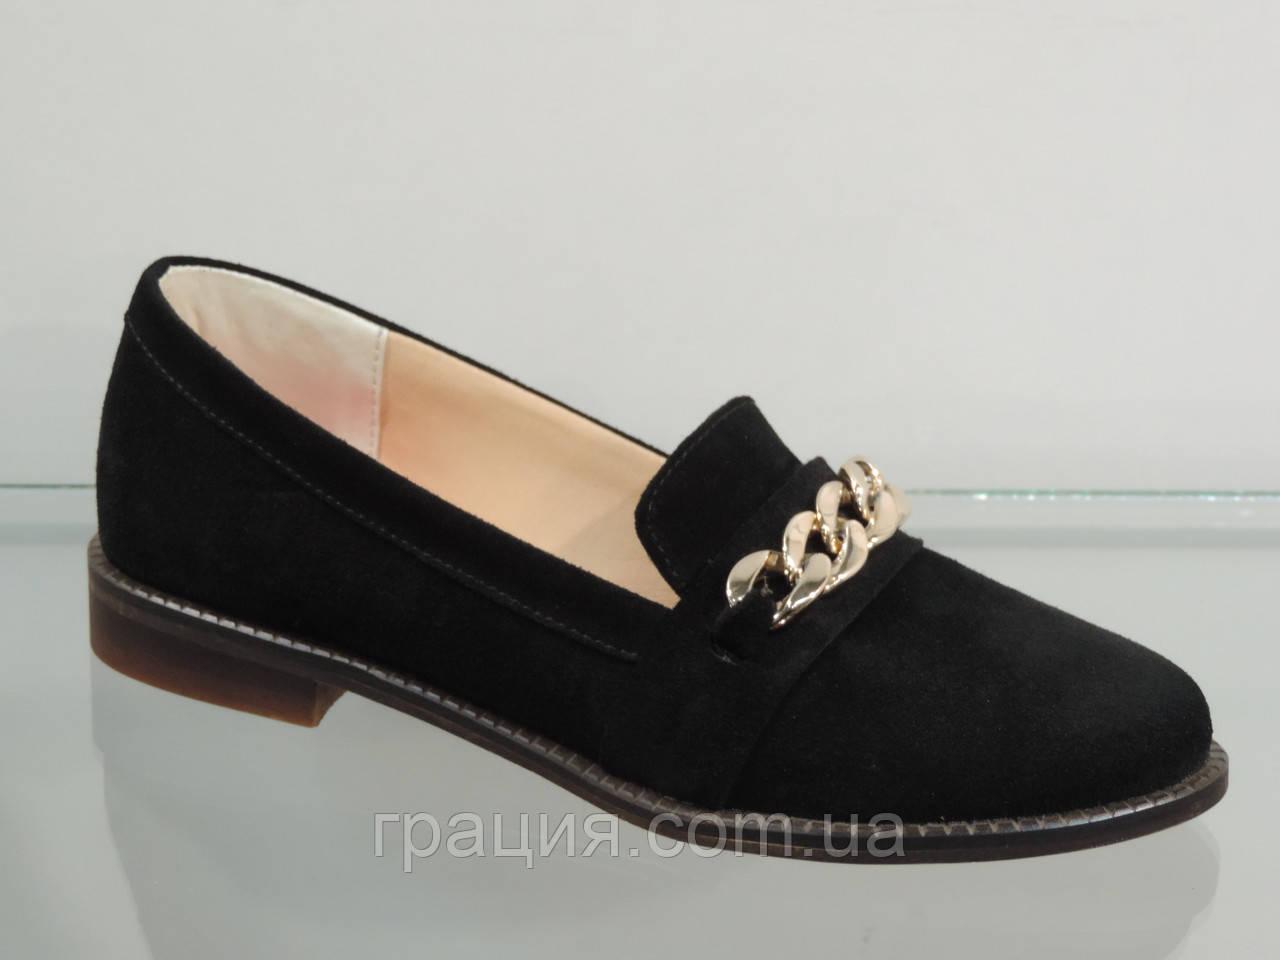 Стильні жіночі туфлі натуральна замша